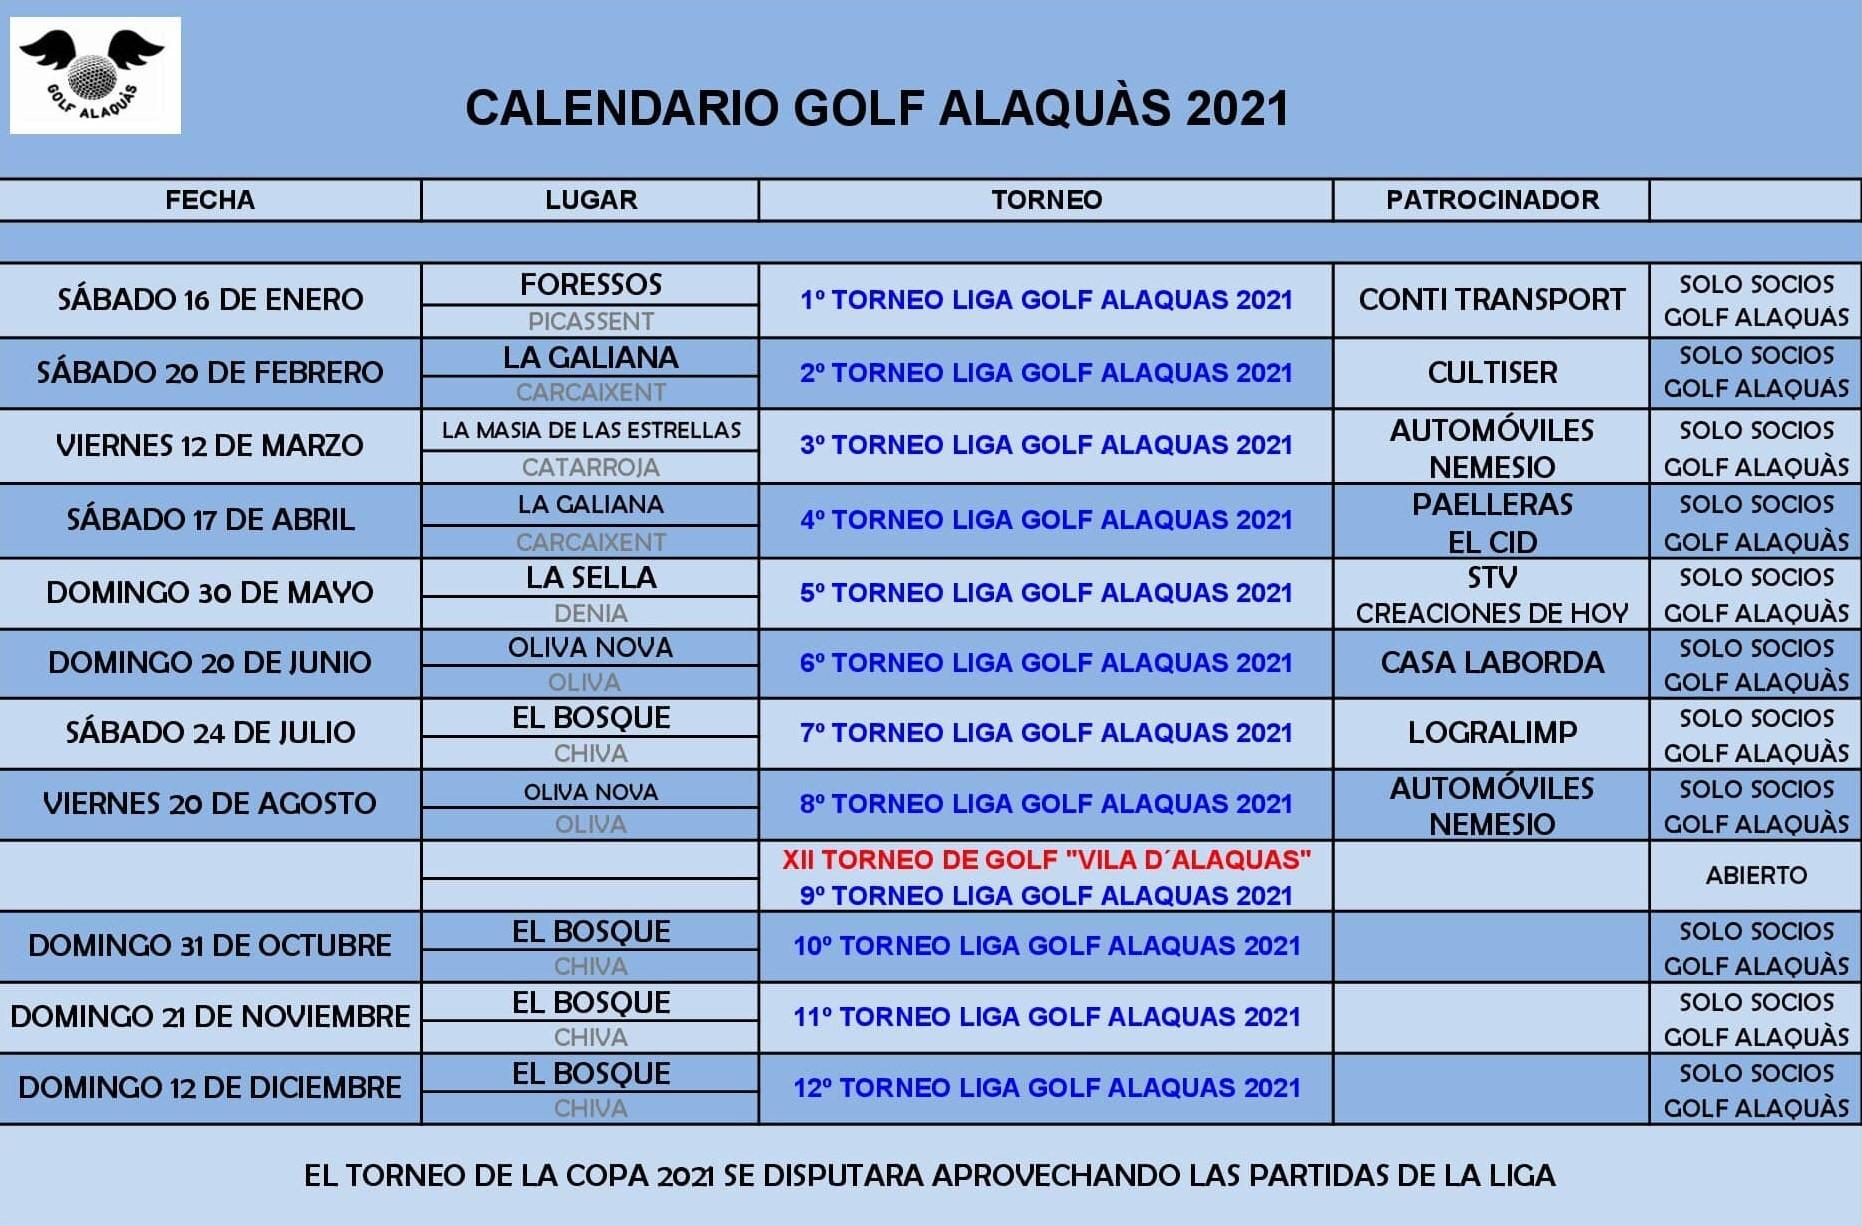 CALENDARIO GOLF ALAQUAS 2021